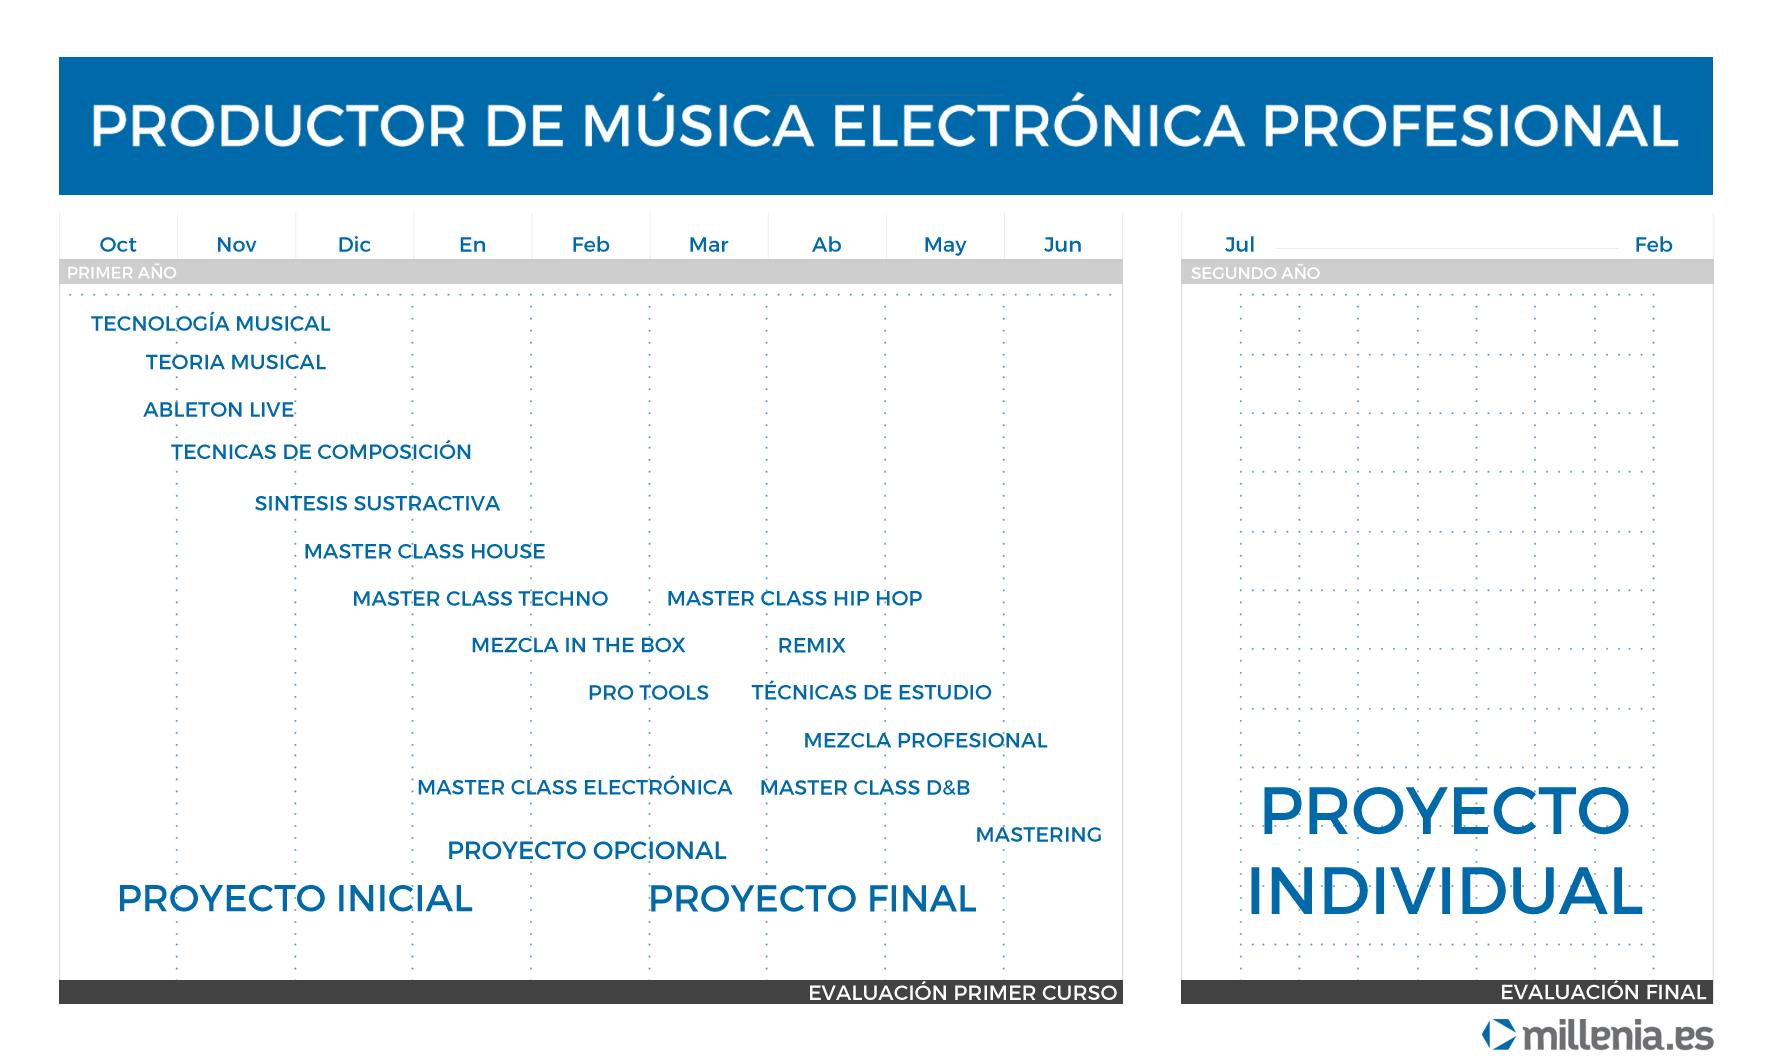 Curso Productor de Música Electrónica Profesional